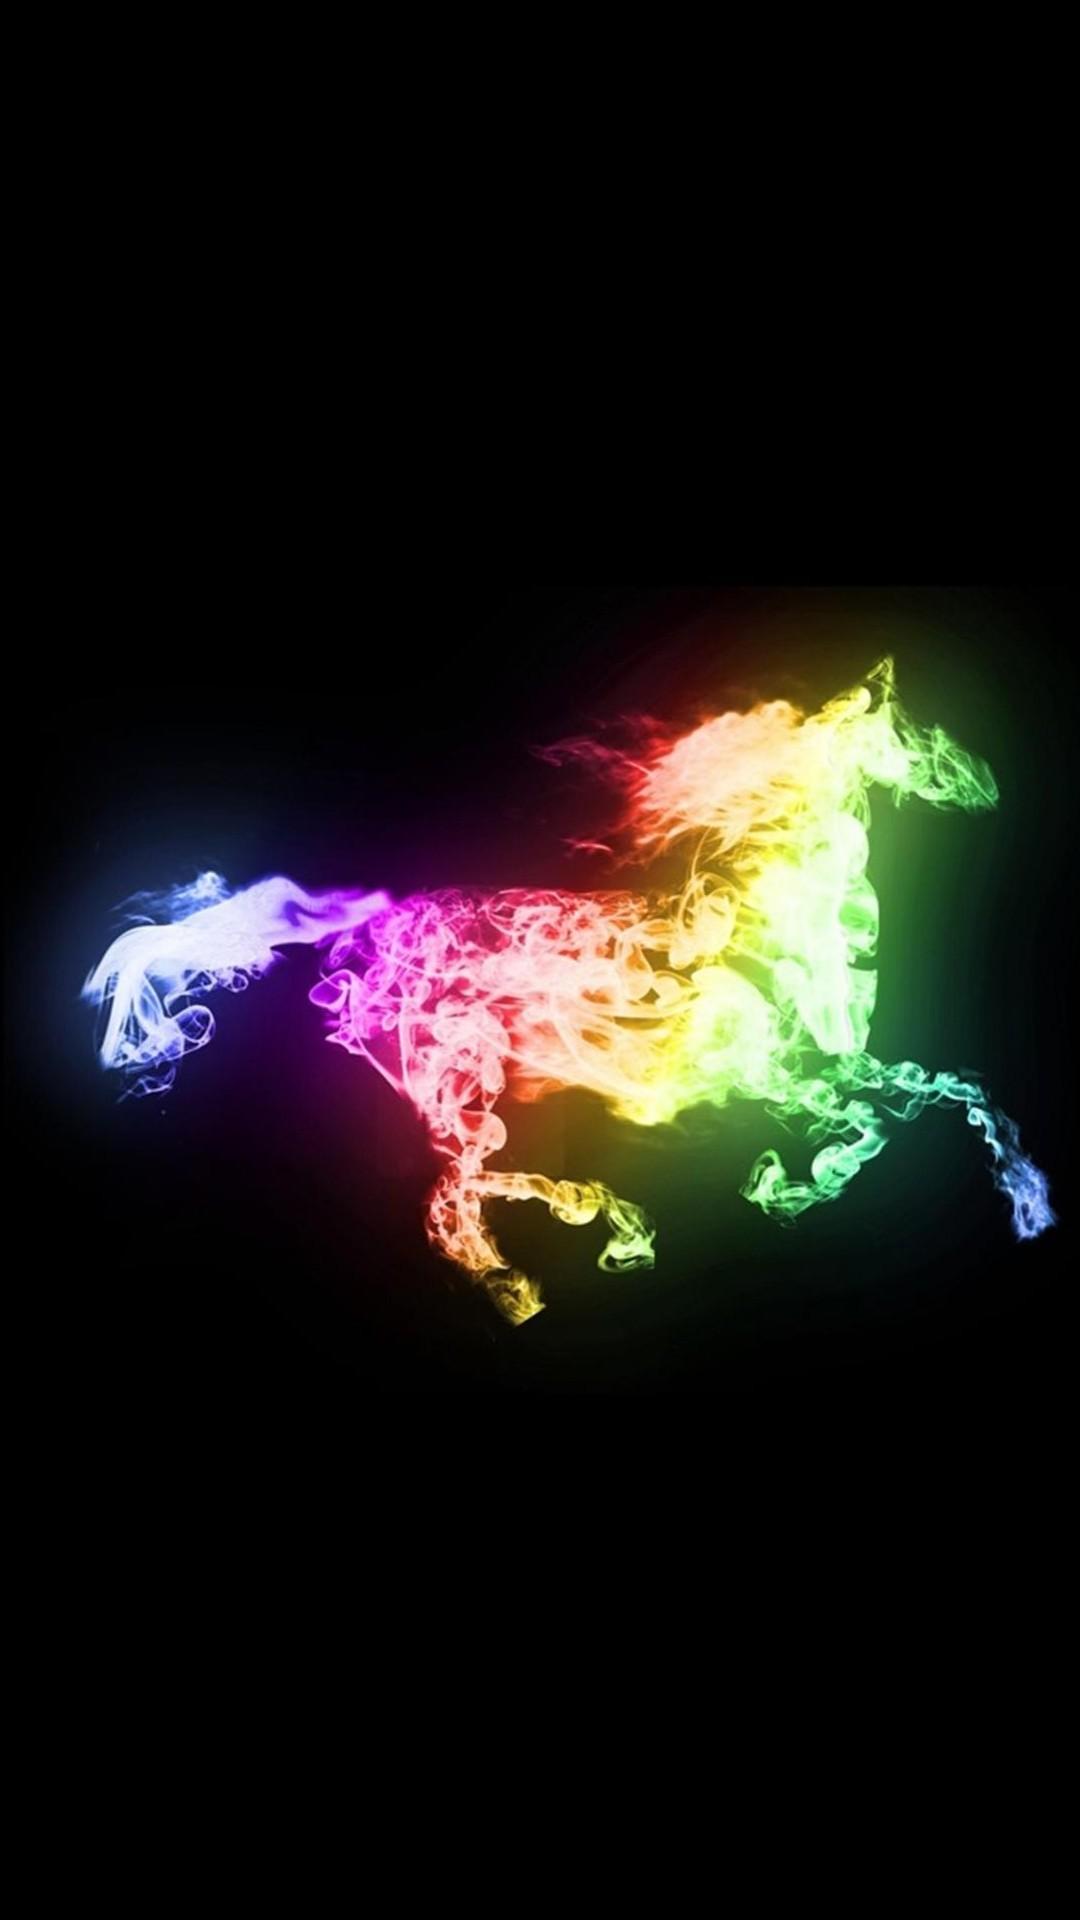 Fire horse wallpaper hd 61 images - Cool animal wallpaper light ...